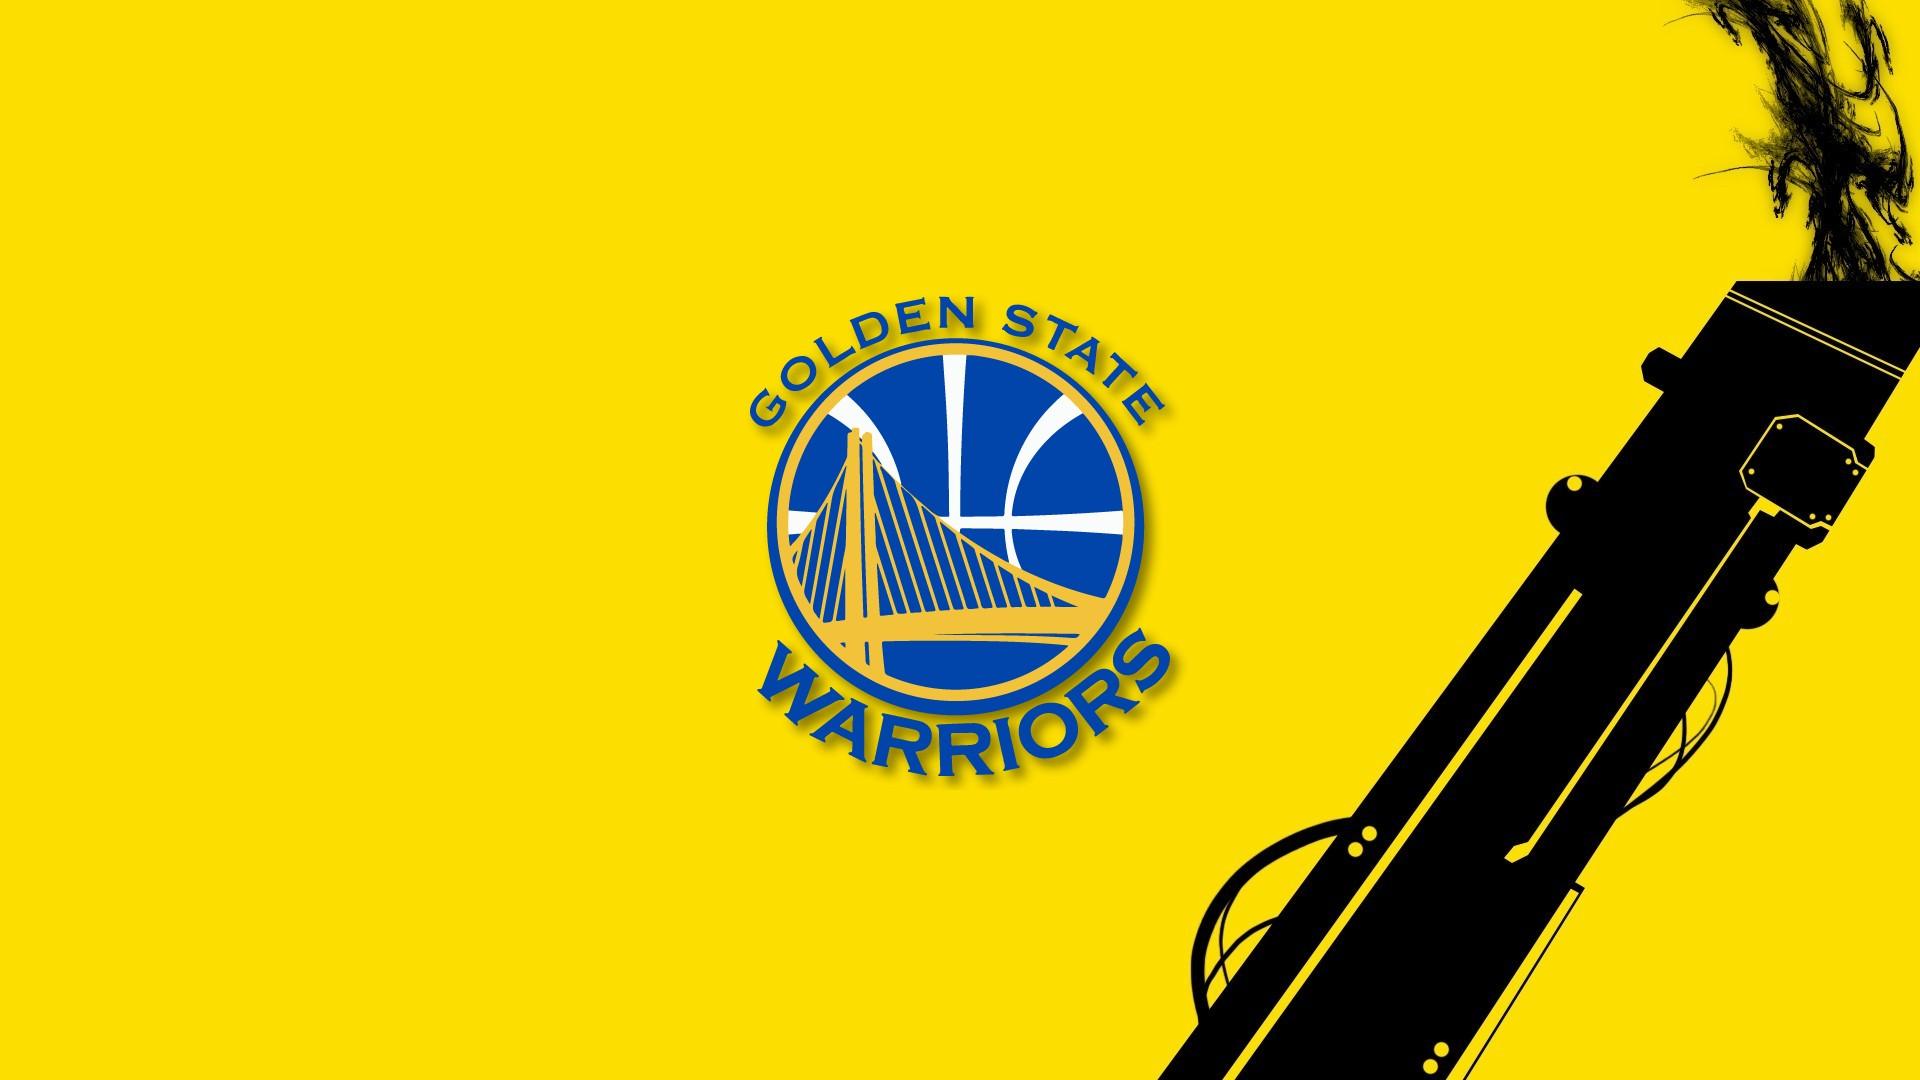 Cool Golden State Warriors Wallpaper Hd 2019 Live Wallpaper - Black And Yellow , HD Wallpaper & Backgrounds